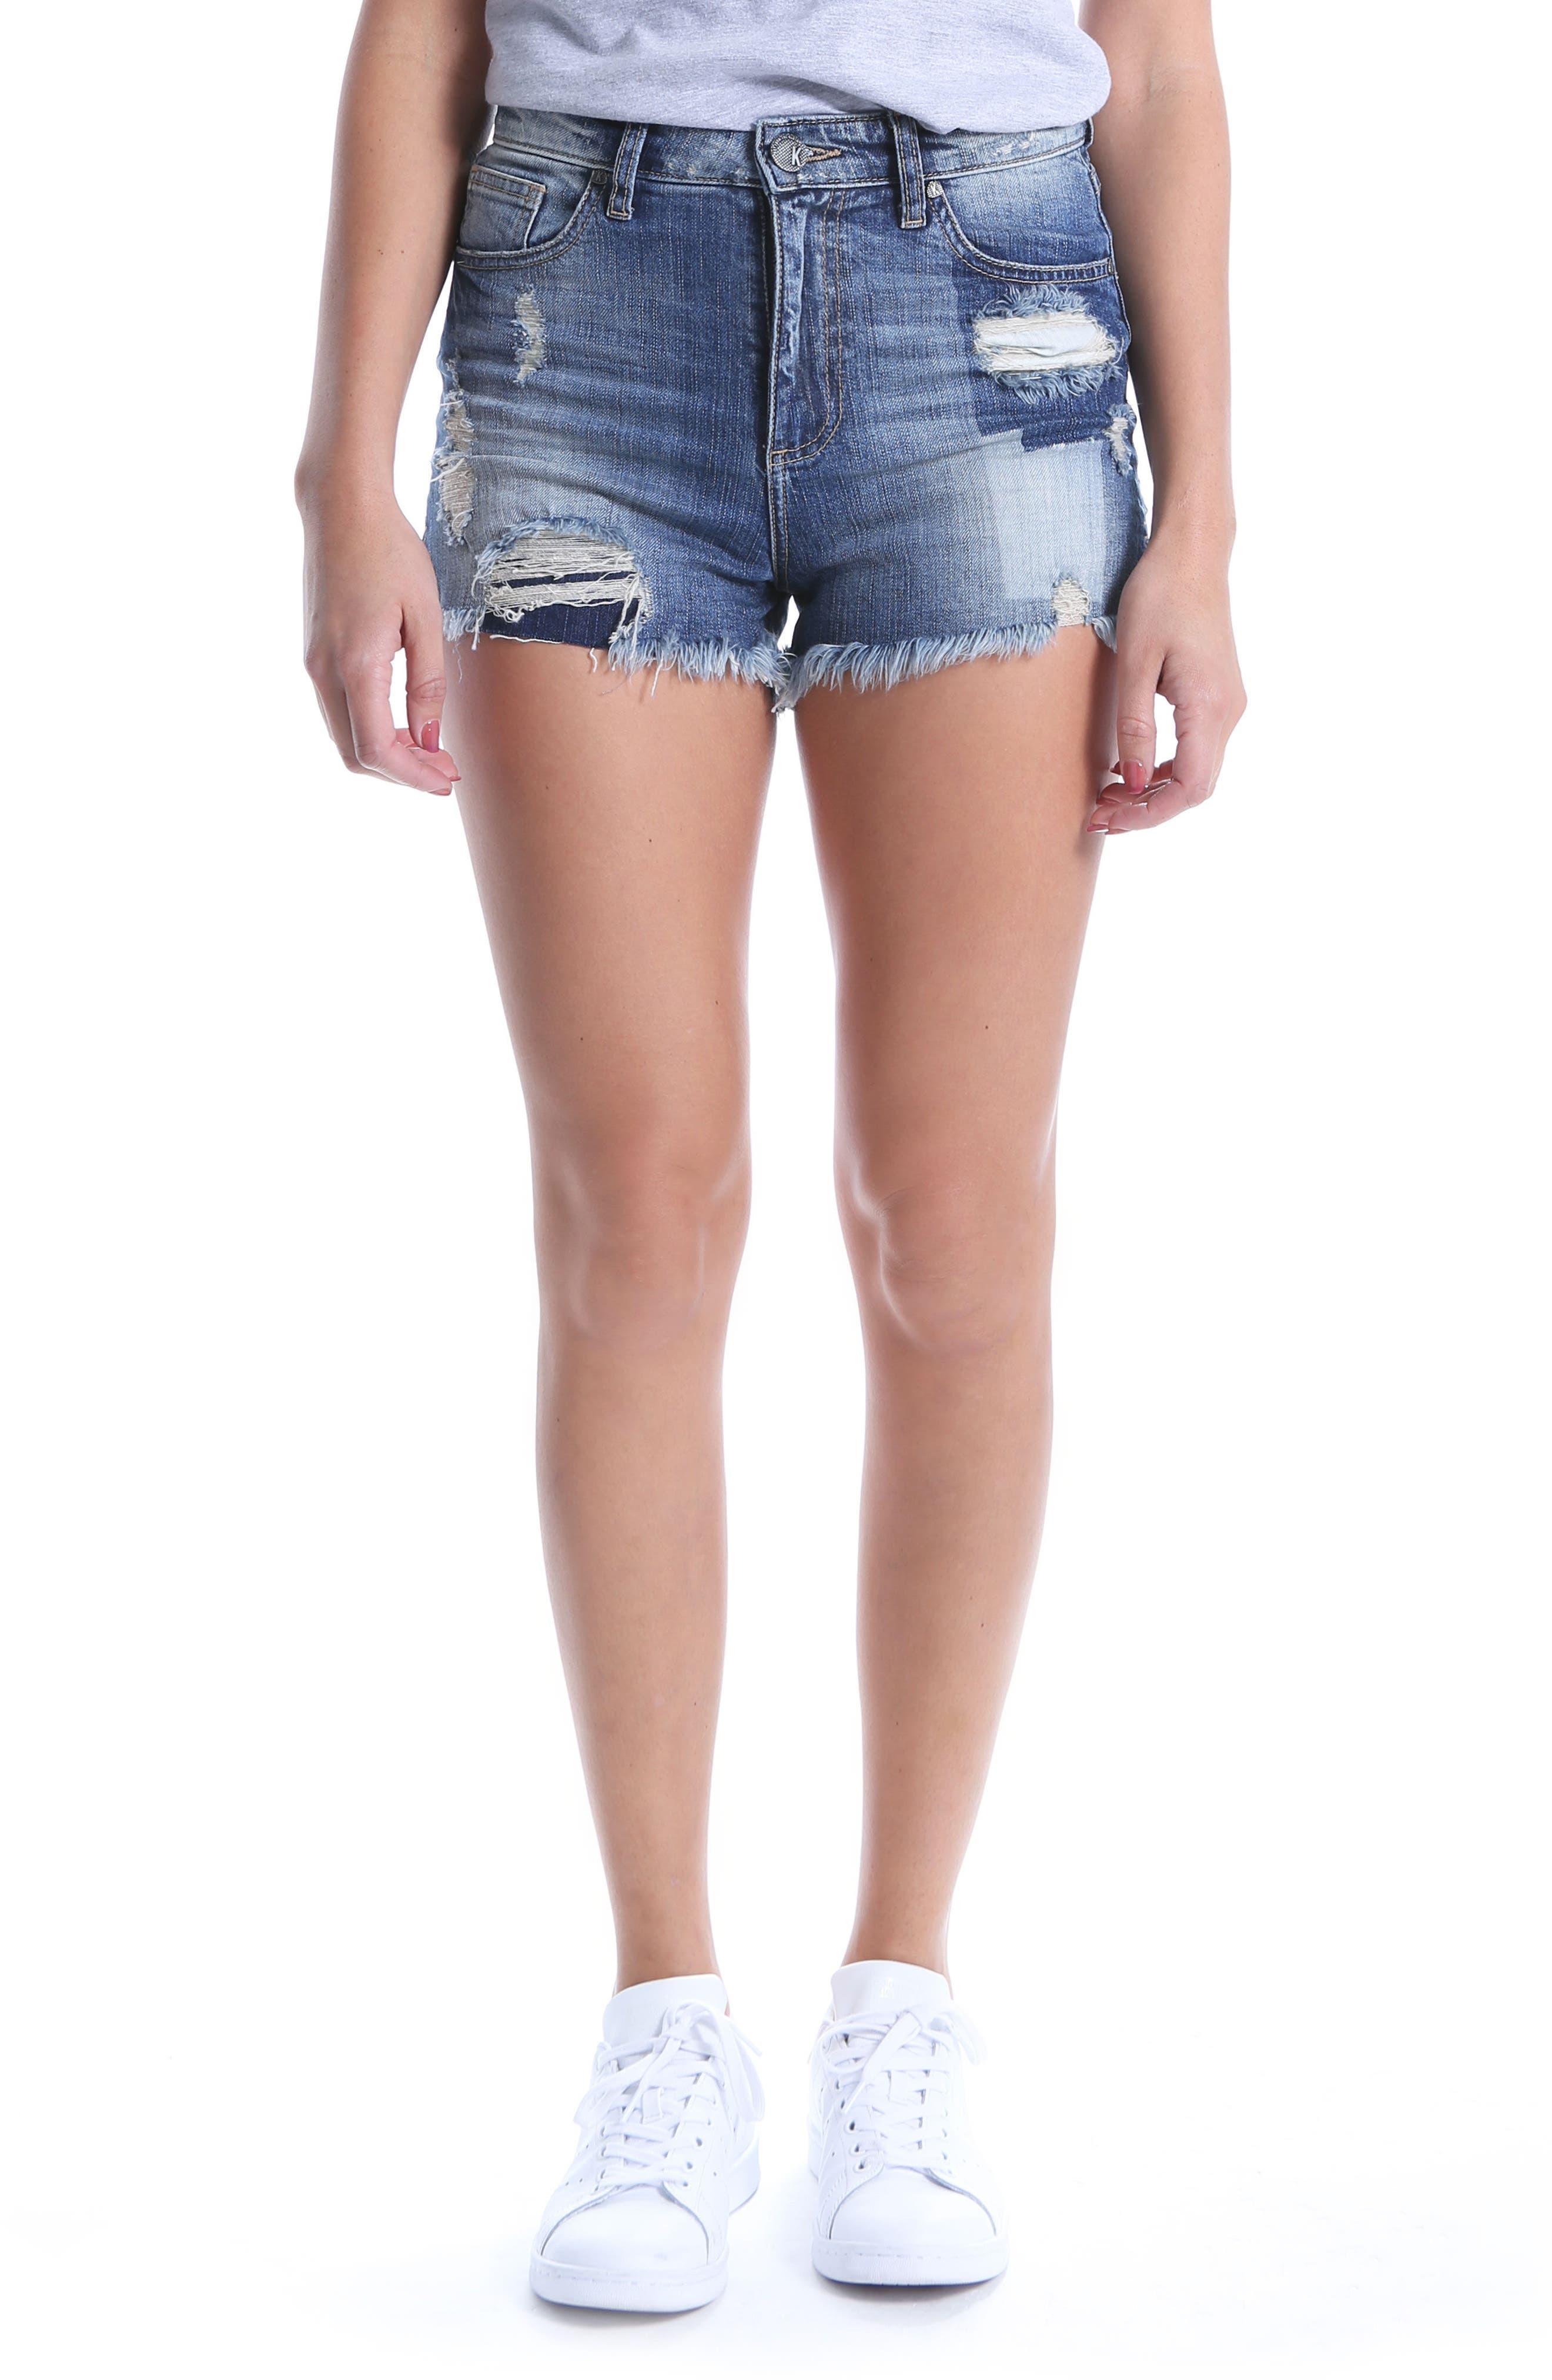 Alternate Image 1 Selected - KUT Kollection High Waist Ripped Denim Shorts (Debuted)